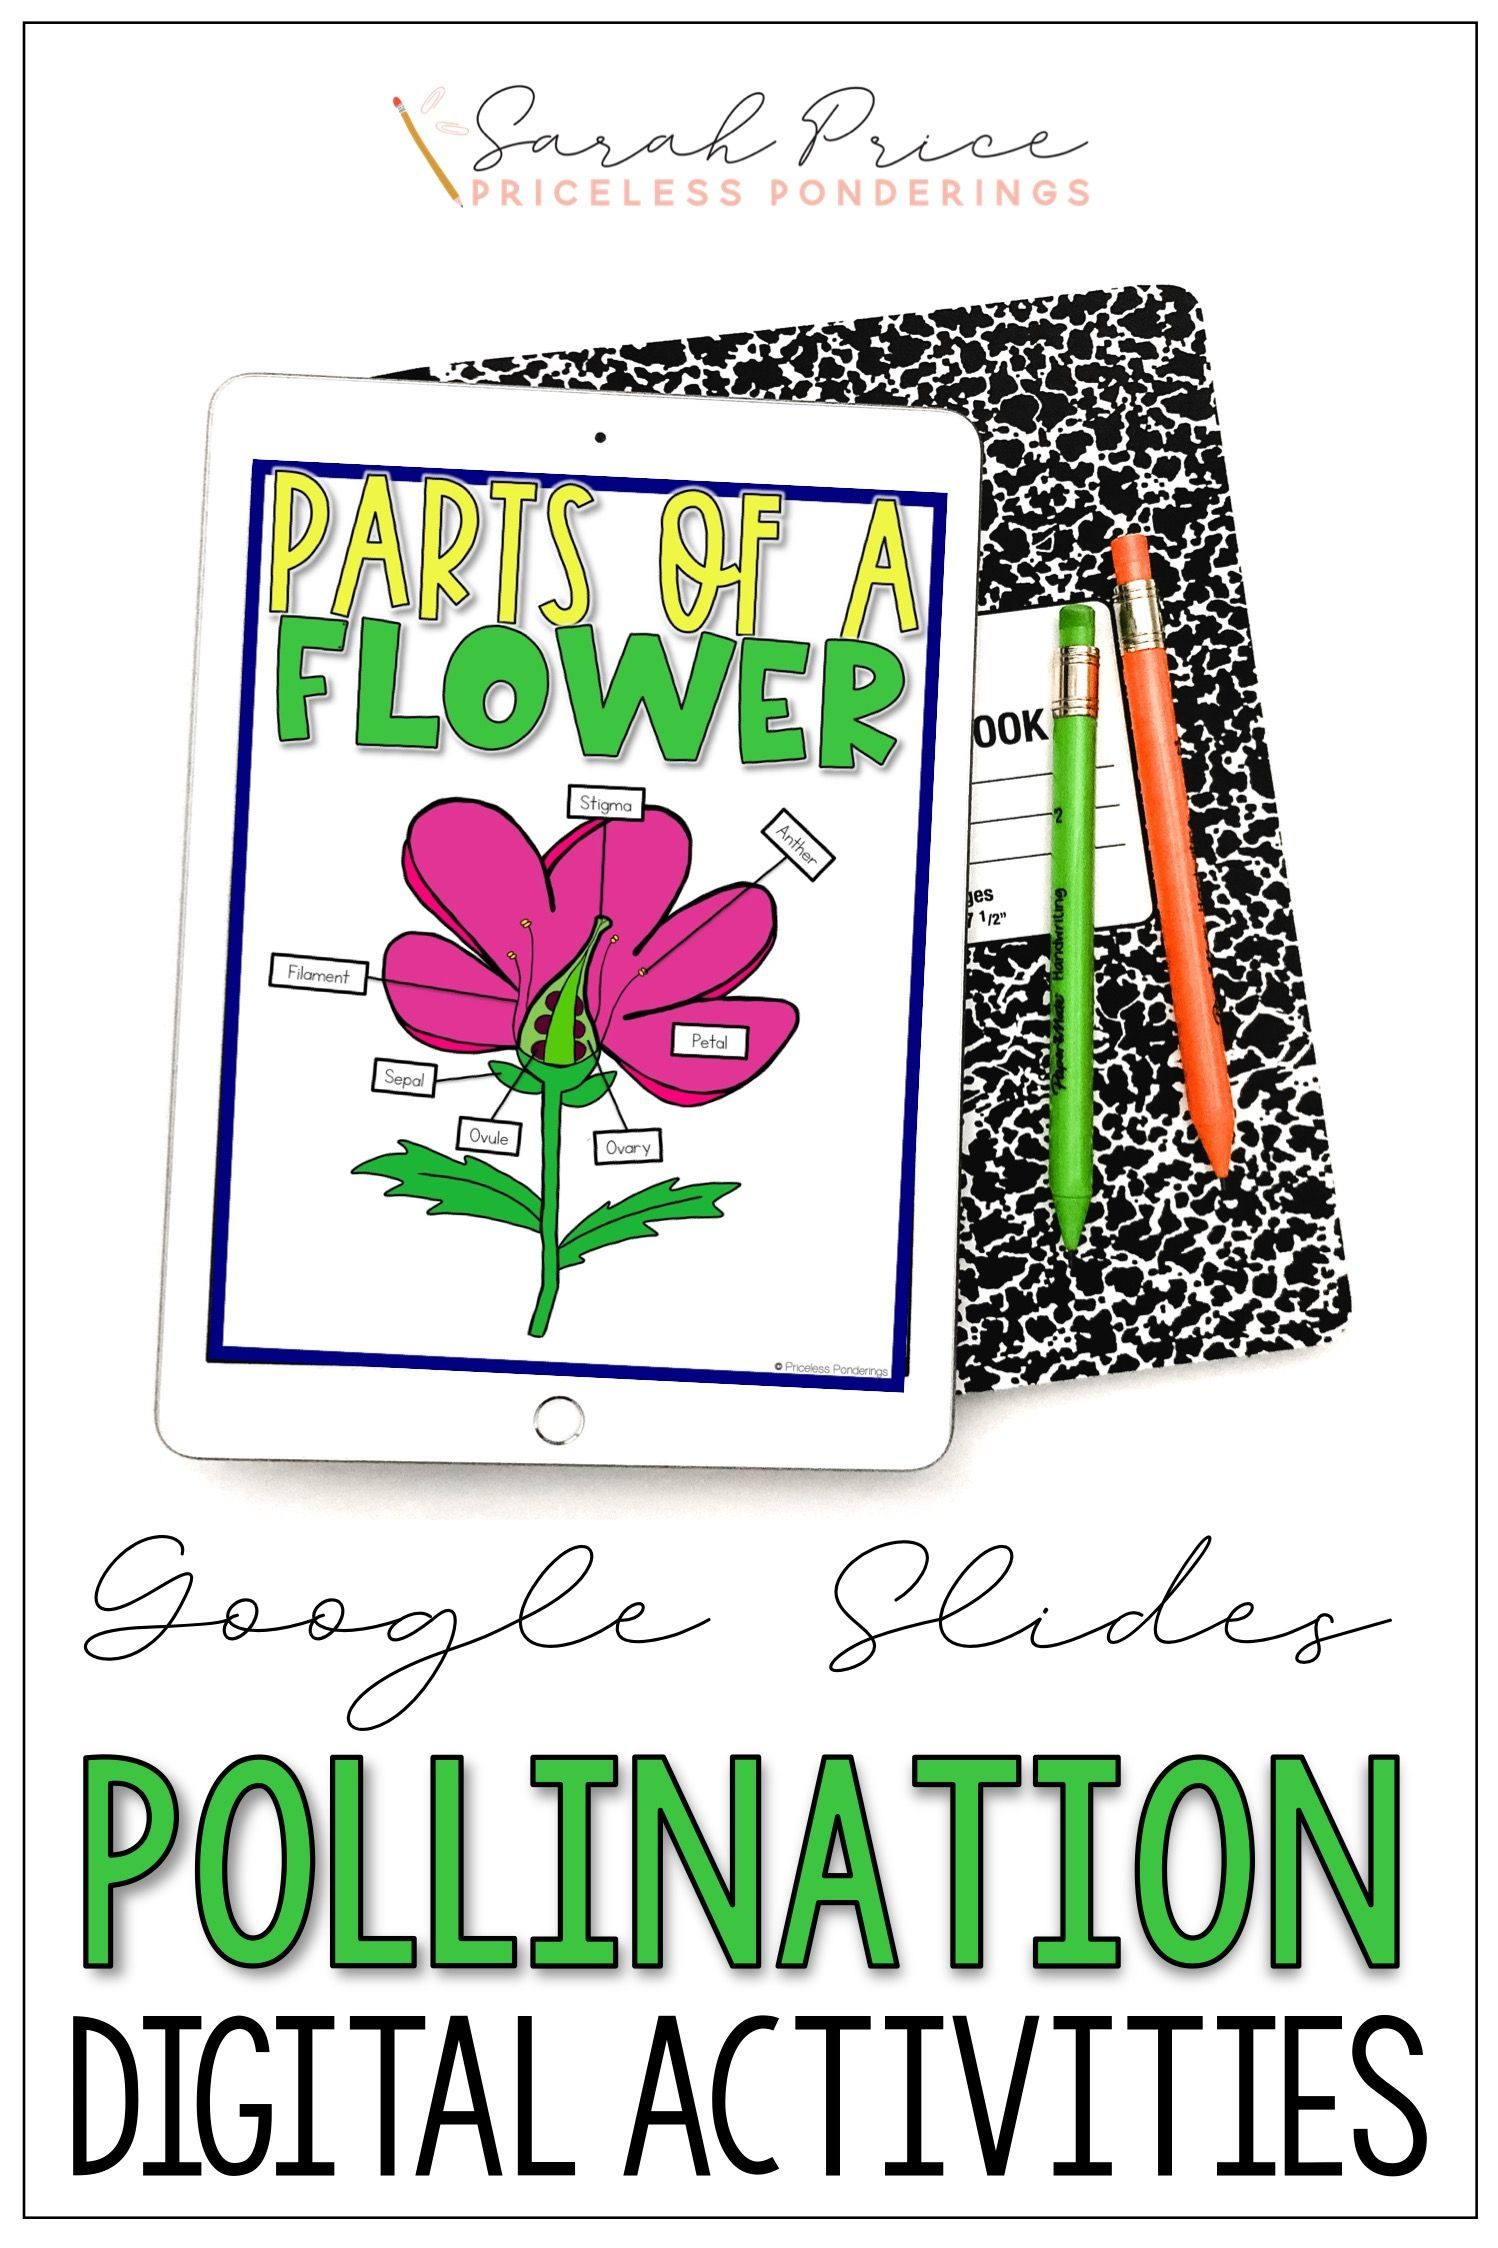 Pollination Activities Slides